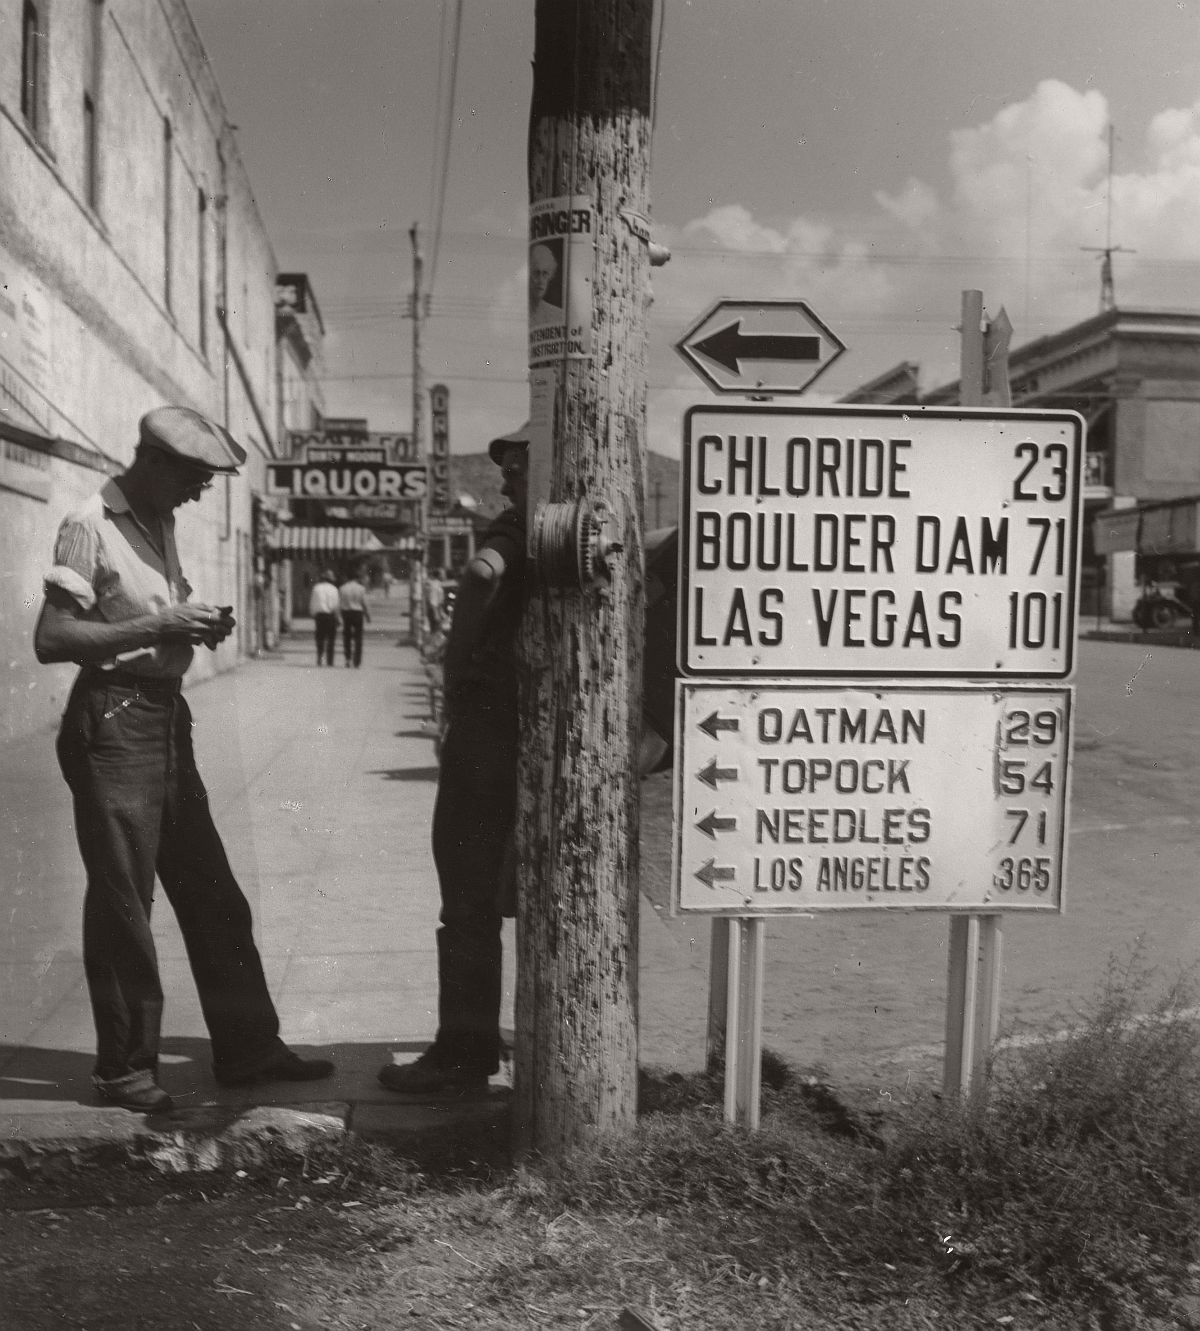 Robert Haas: Street scene, United States, 1940 © Wien Museum/Sammlung Robert Haas